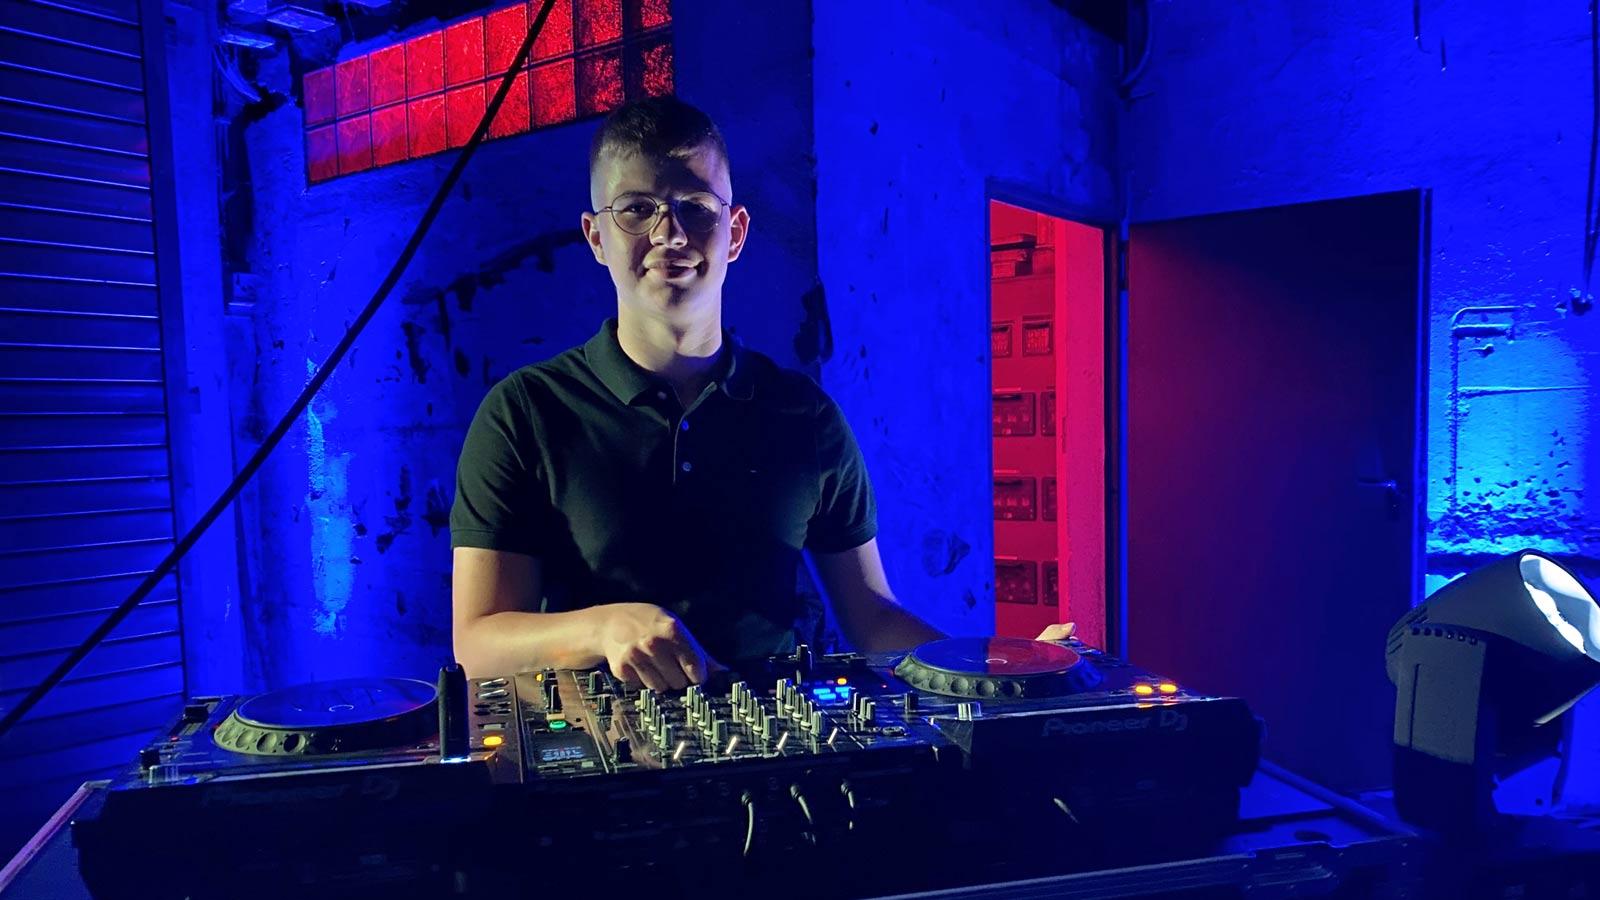 DJ Nils Siegen